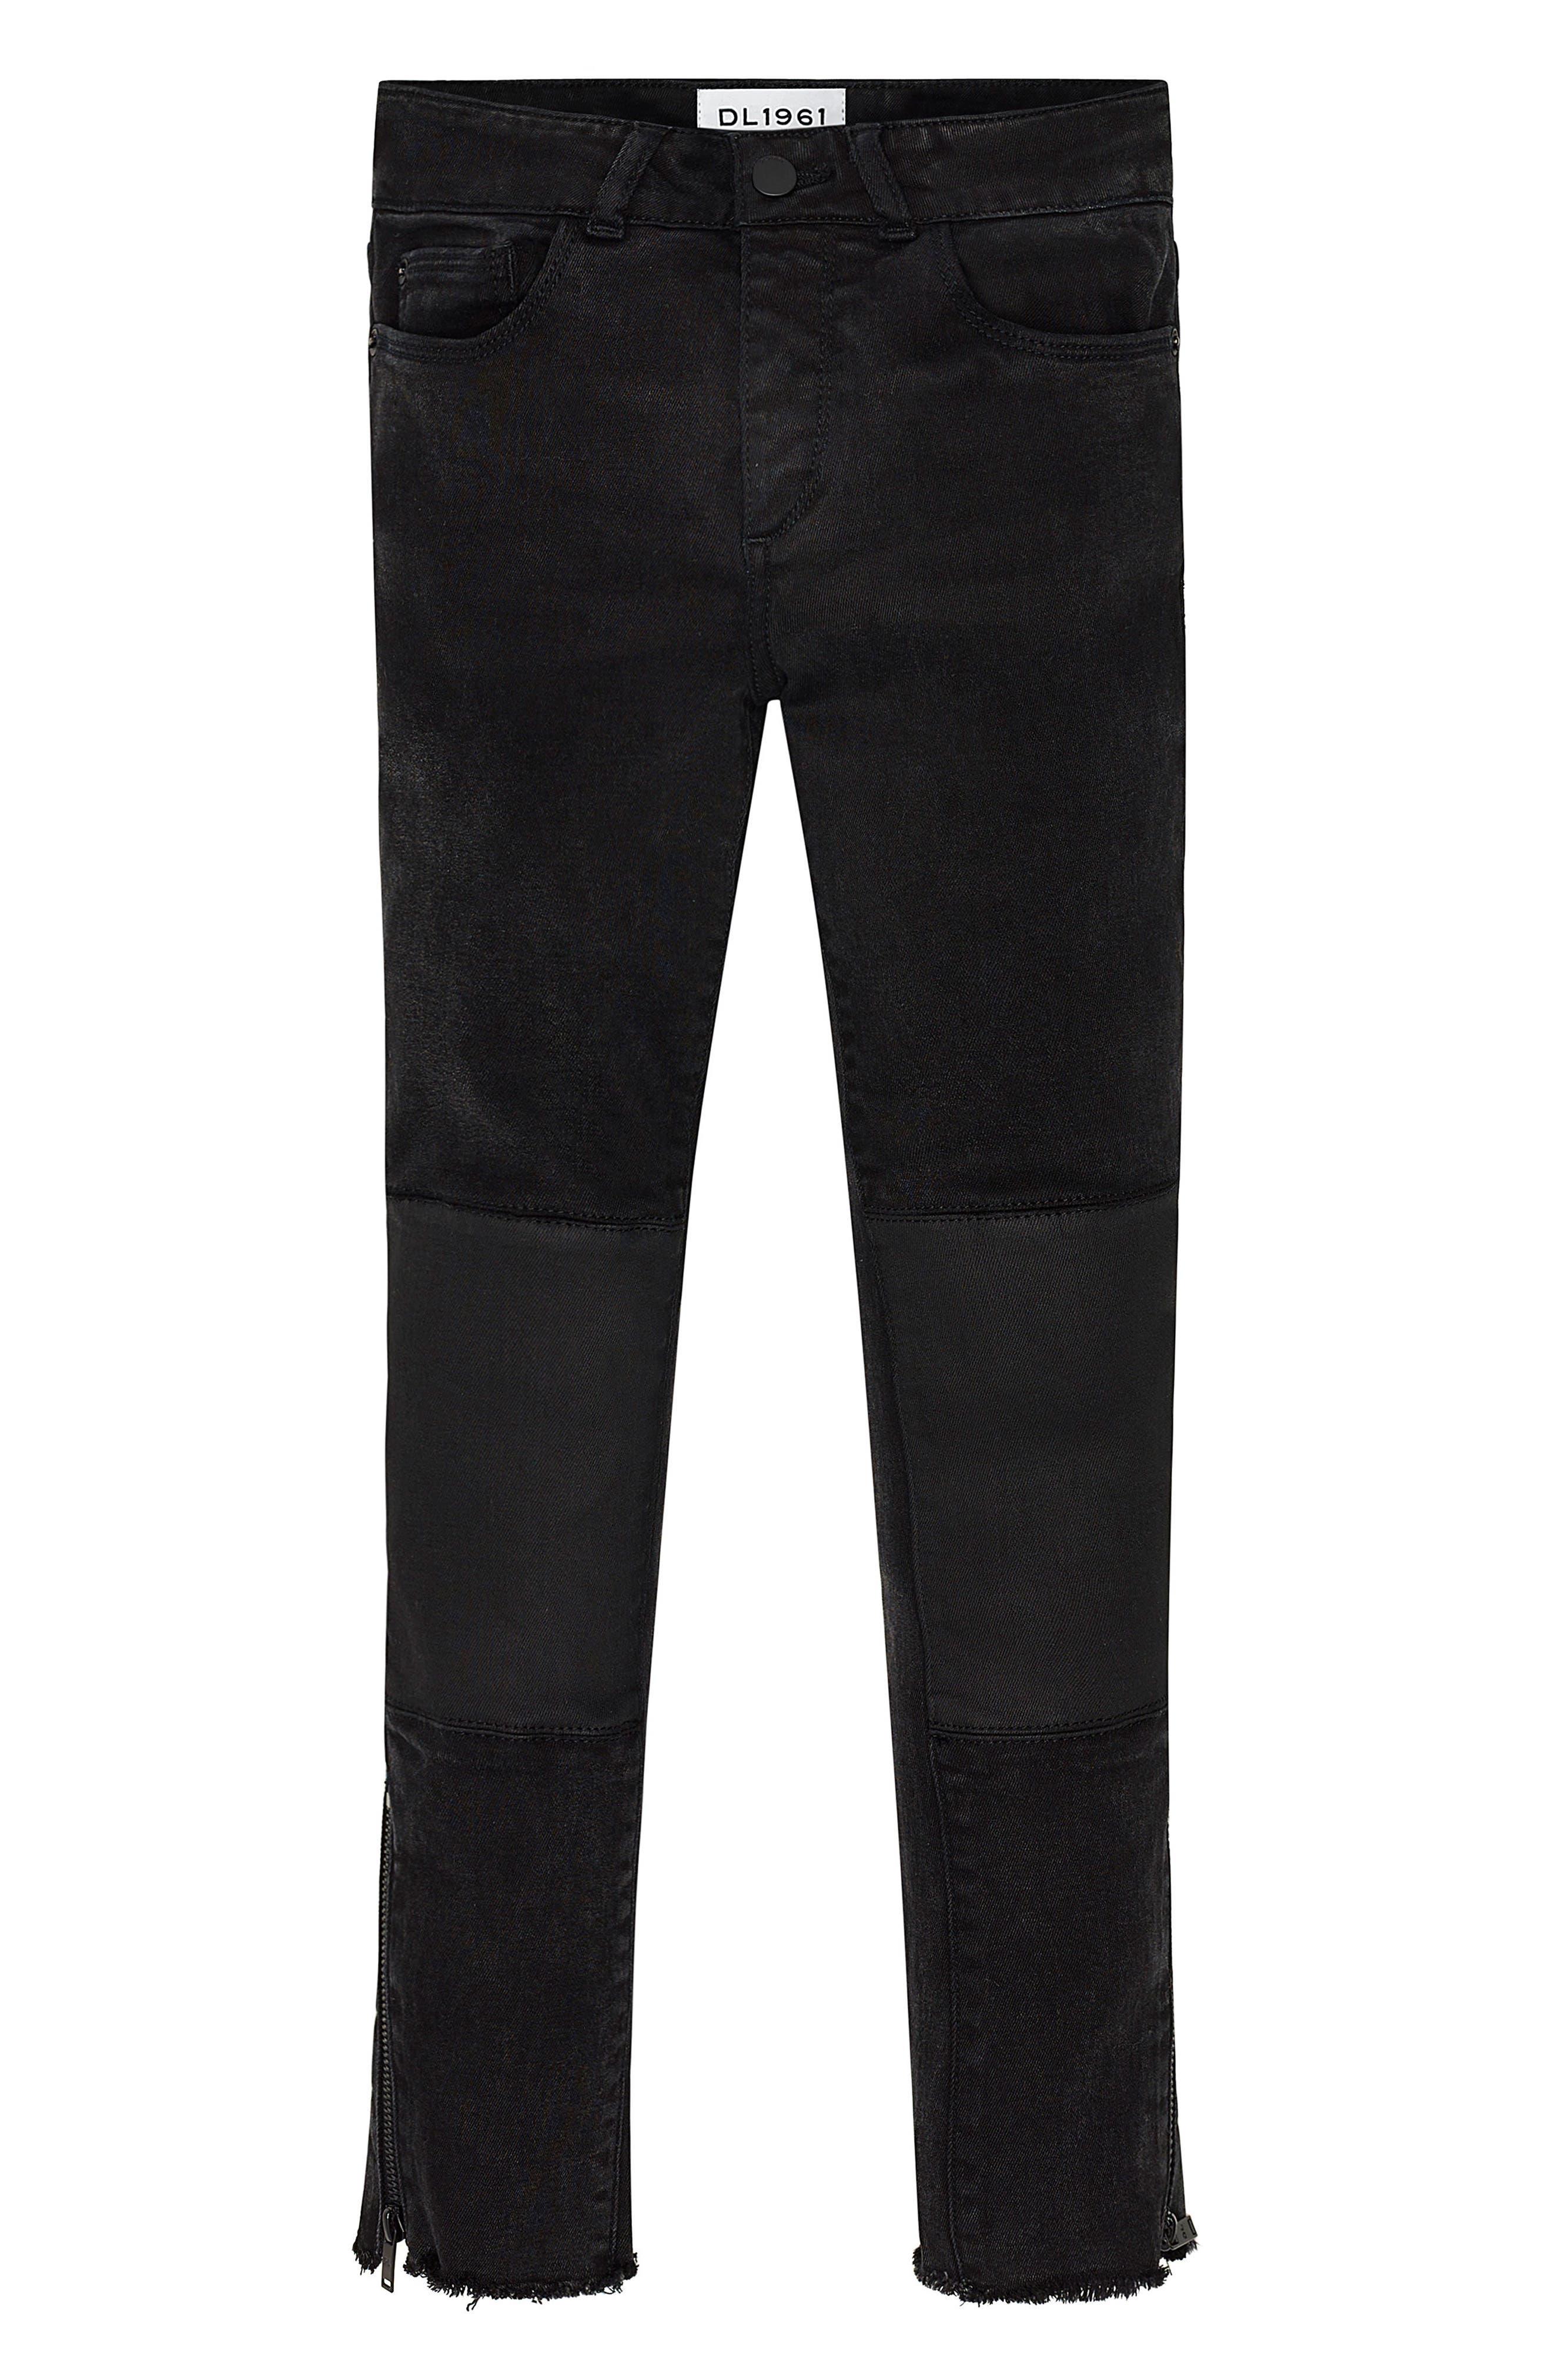 Chloe Moto Skinny Jeans,                             Main thumbnail 1, color,                             Roxanne